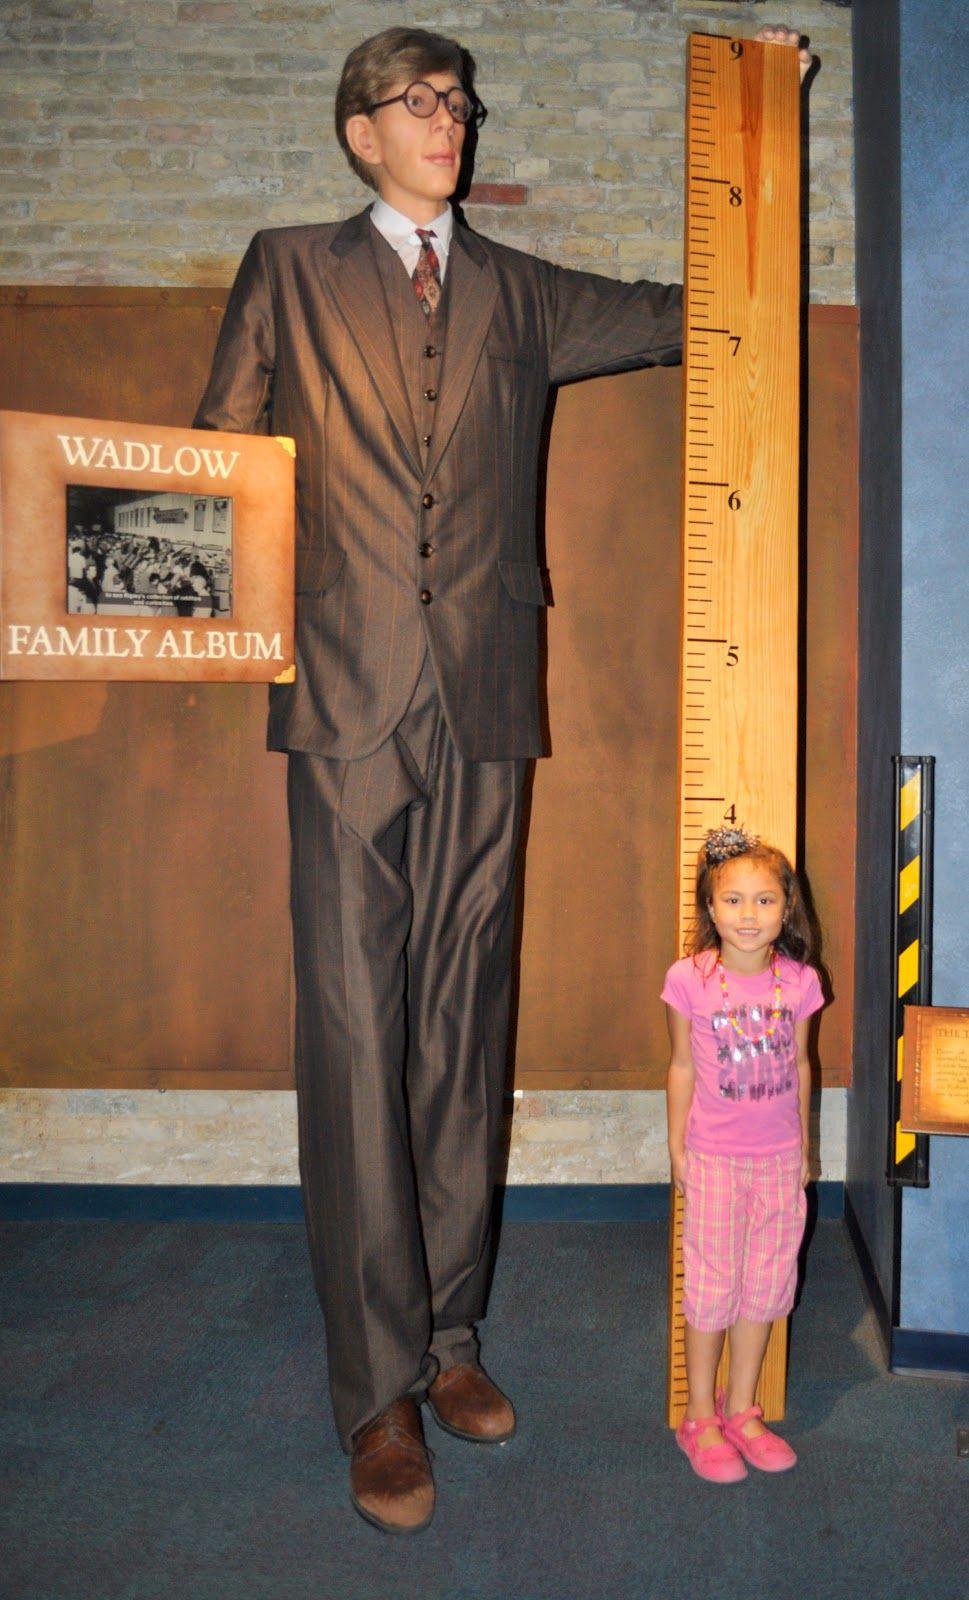 Tallest Man Exhibit Ripleys Believe It Or Not Cool Exhibits Tall